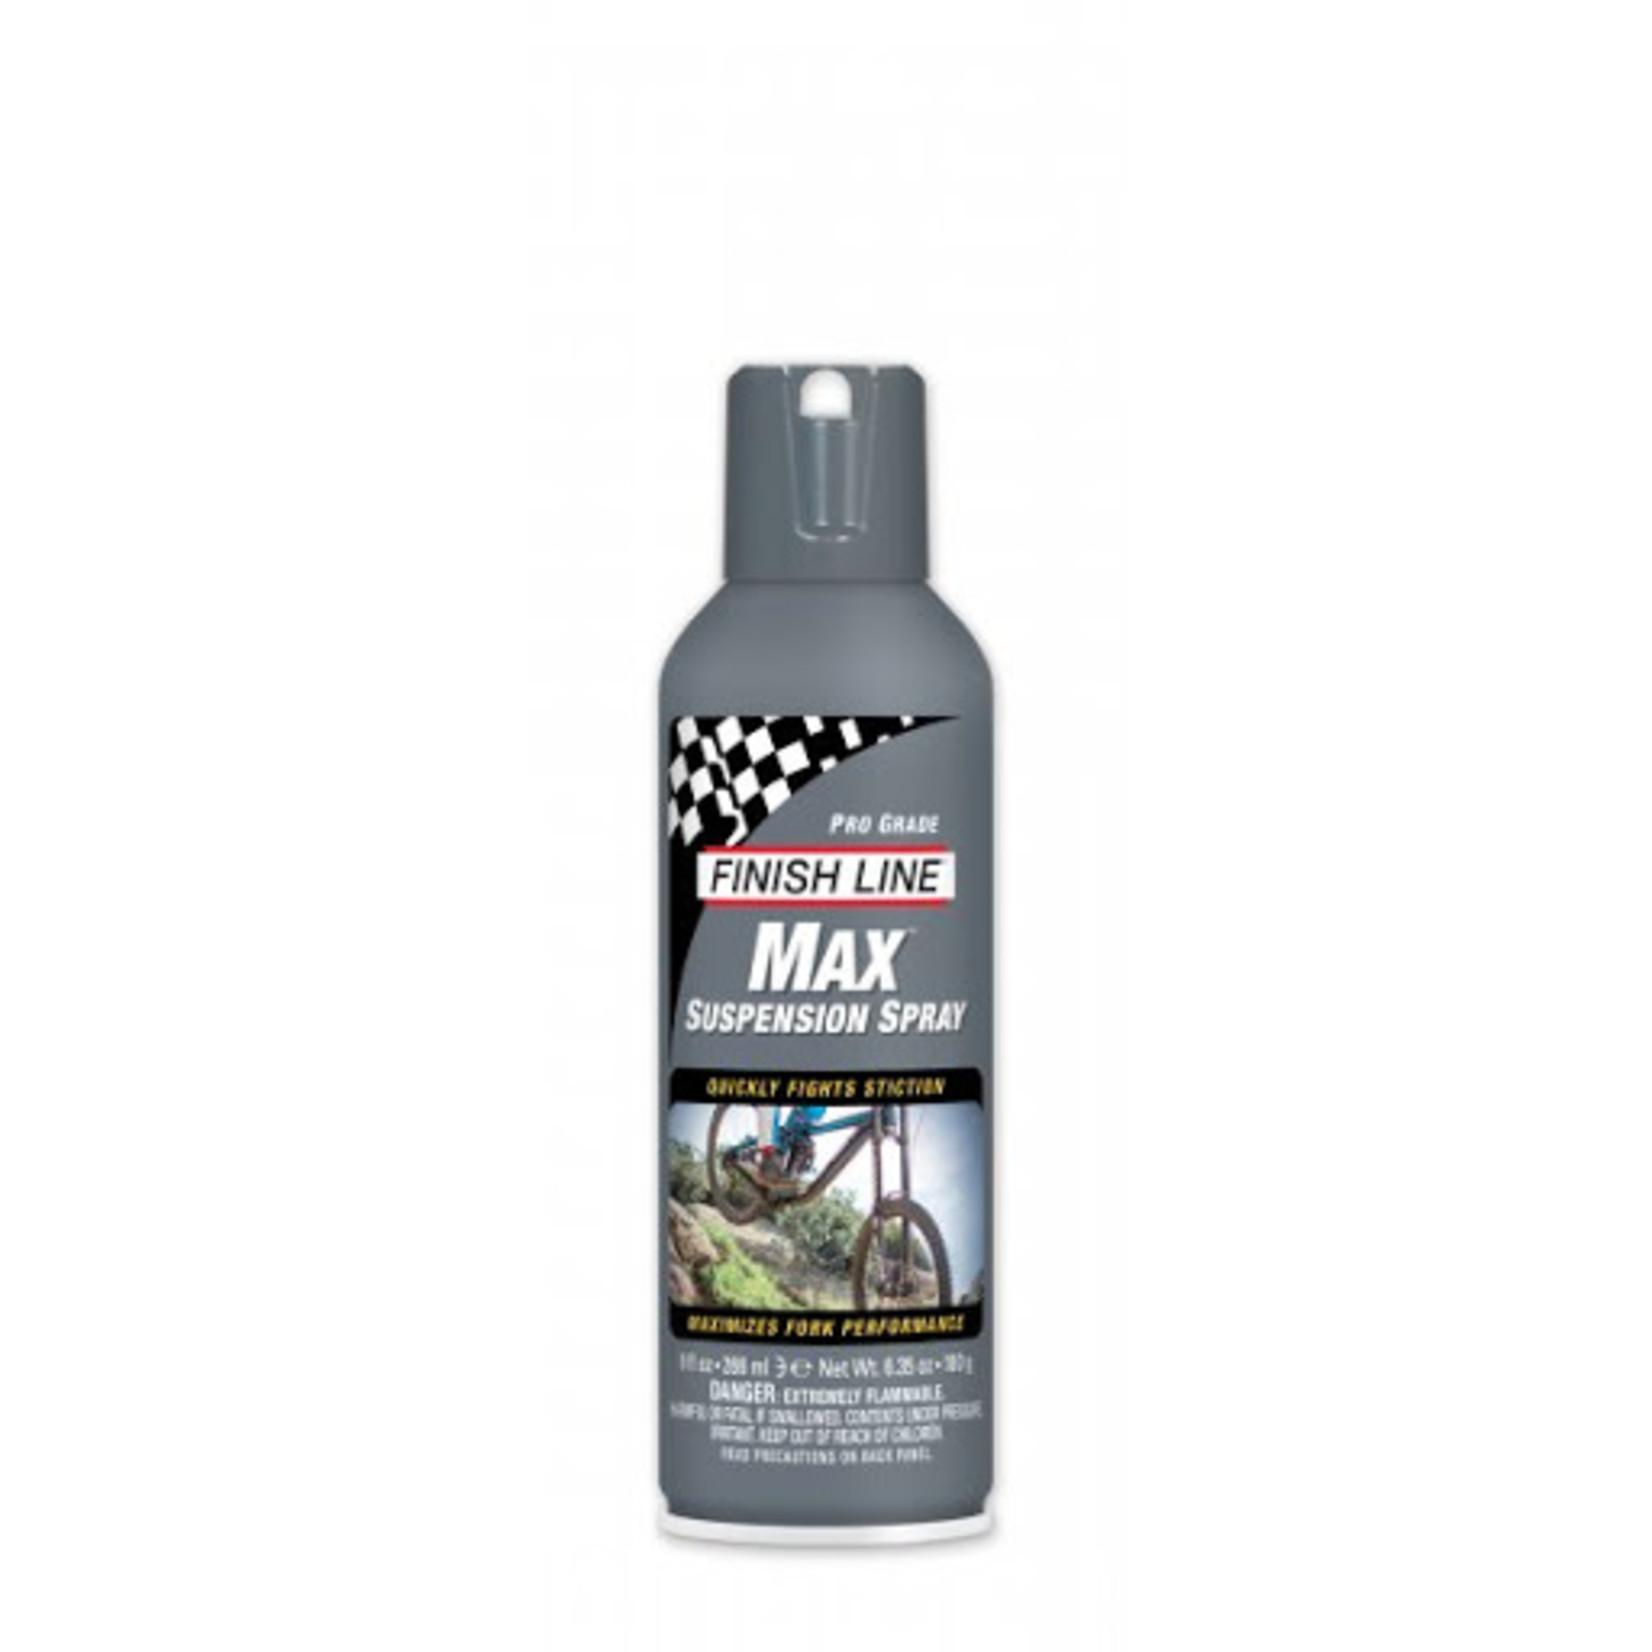 Finish Line Finish Line Max Suspension Spray, 9oz